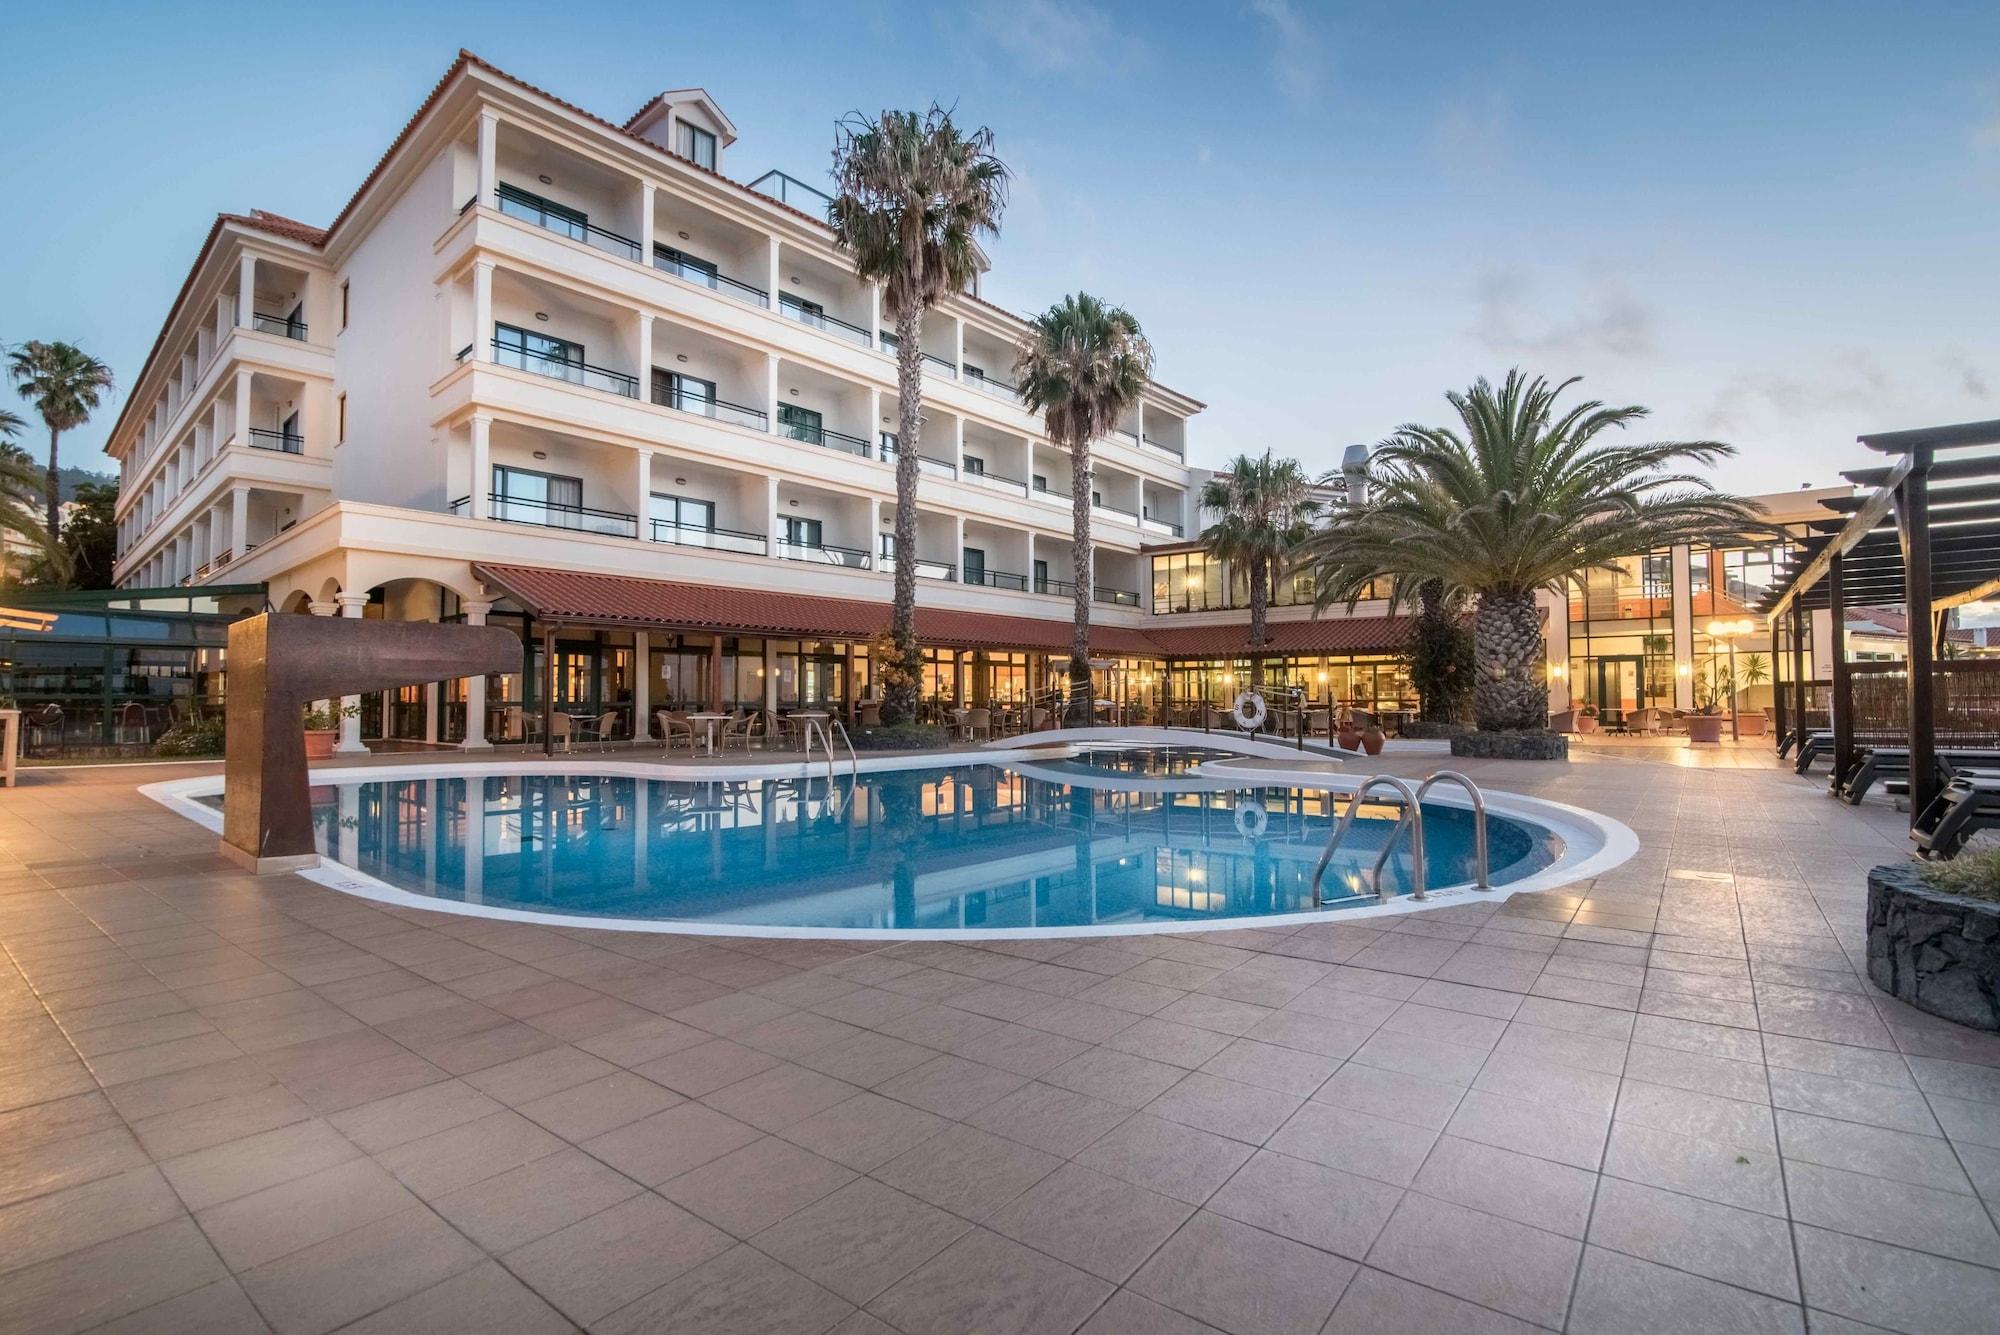 Galo Resort Hotel Galosol, Santa Cruz